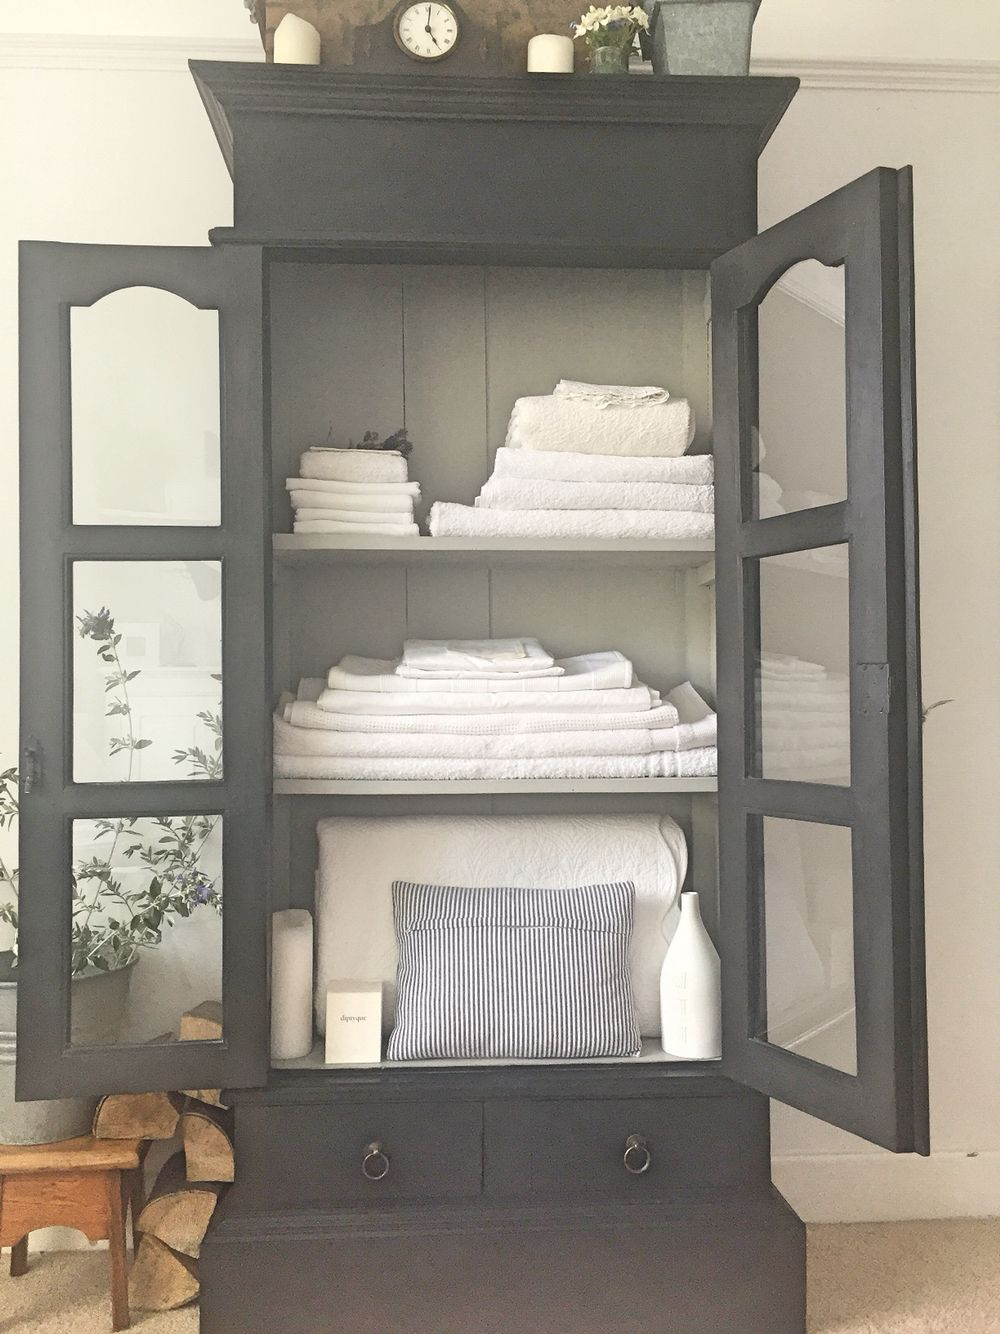 Linen Storage Charcoal And Dove Grey Www Livedandloved Co Uk Linen Storage Cabinet Cabinet Furniture Furniture